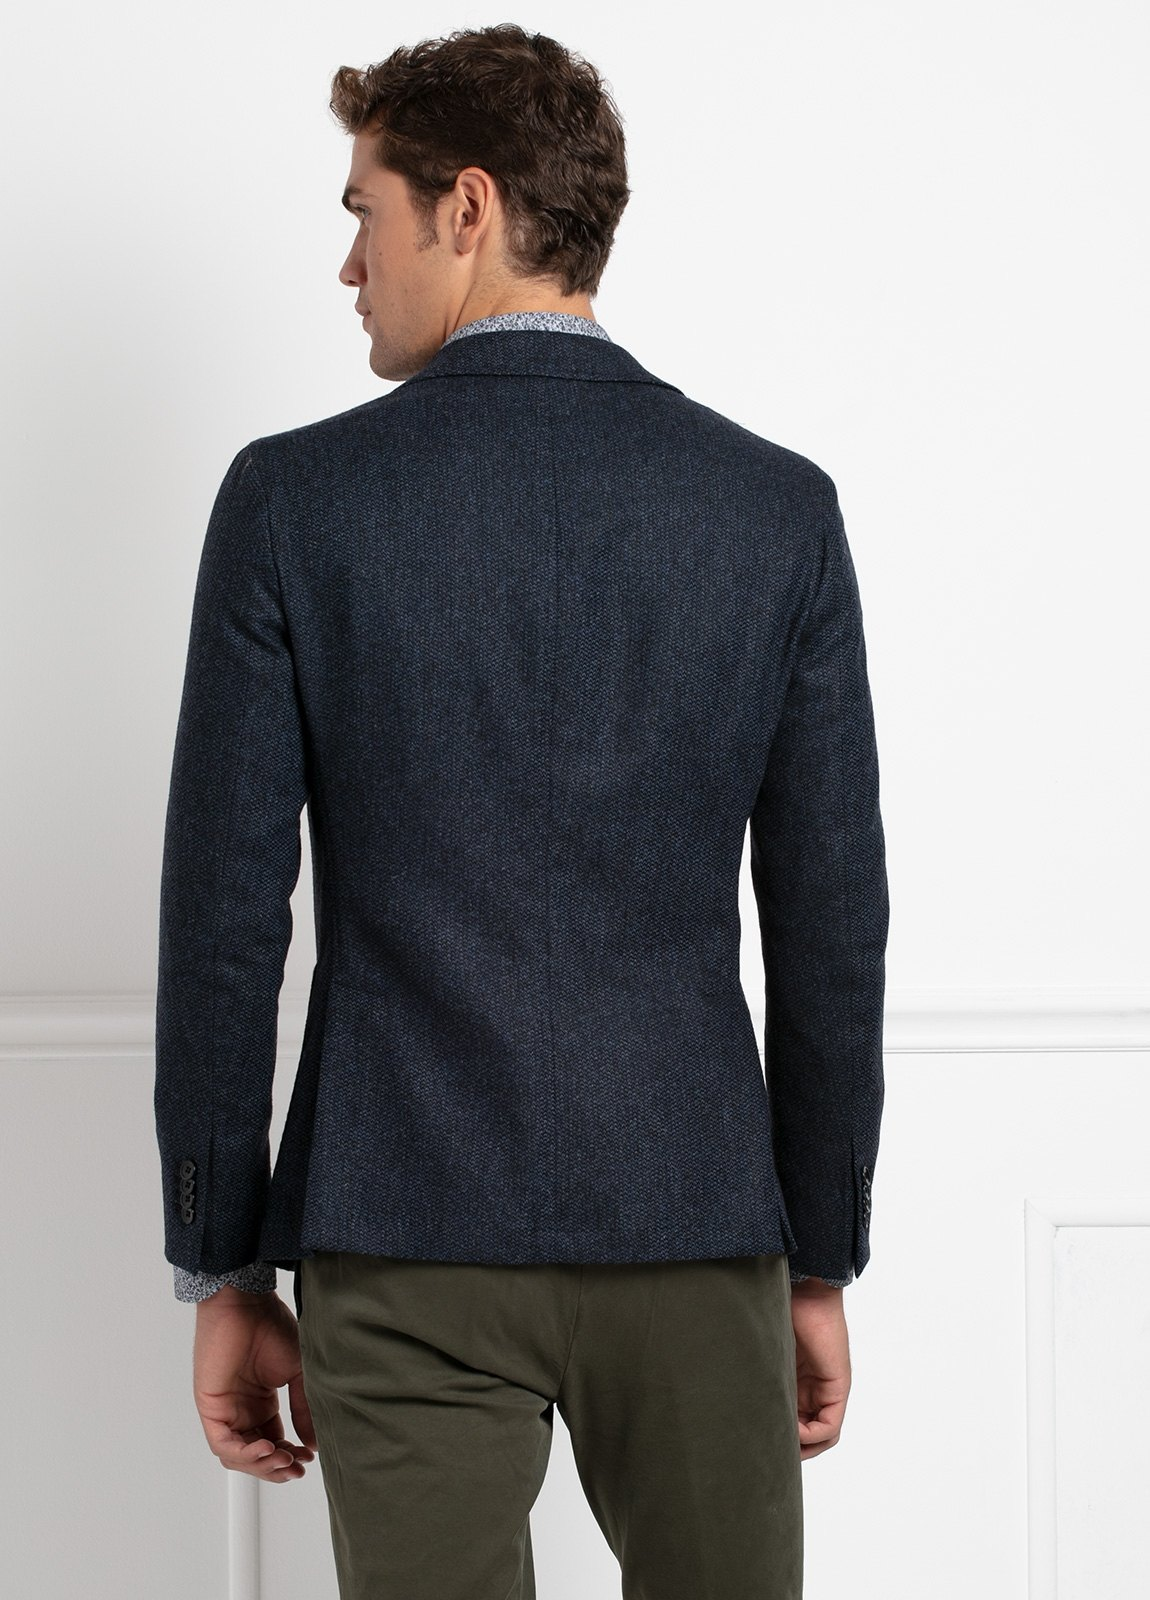 Americana SOFT JACKET Slim Fit, tejido textura color azul oscuro. 97% Lana, 3% Cashmere. - Ítem3